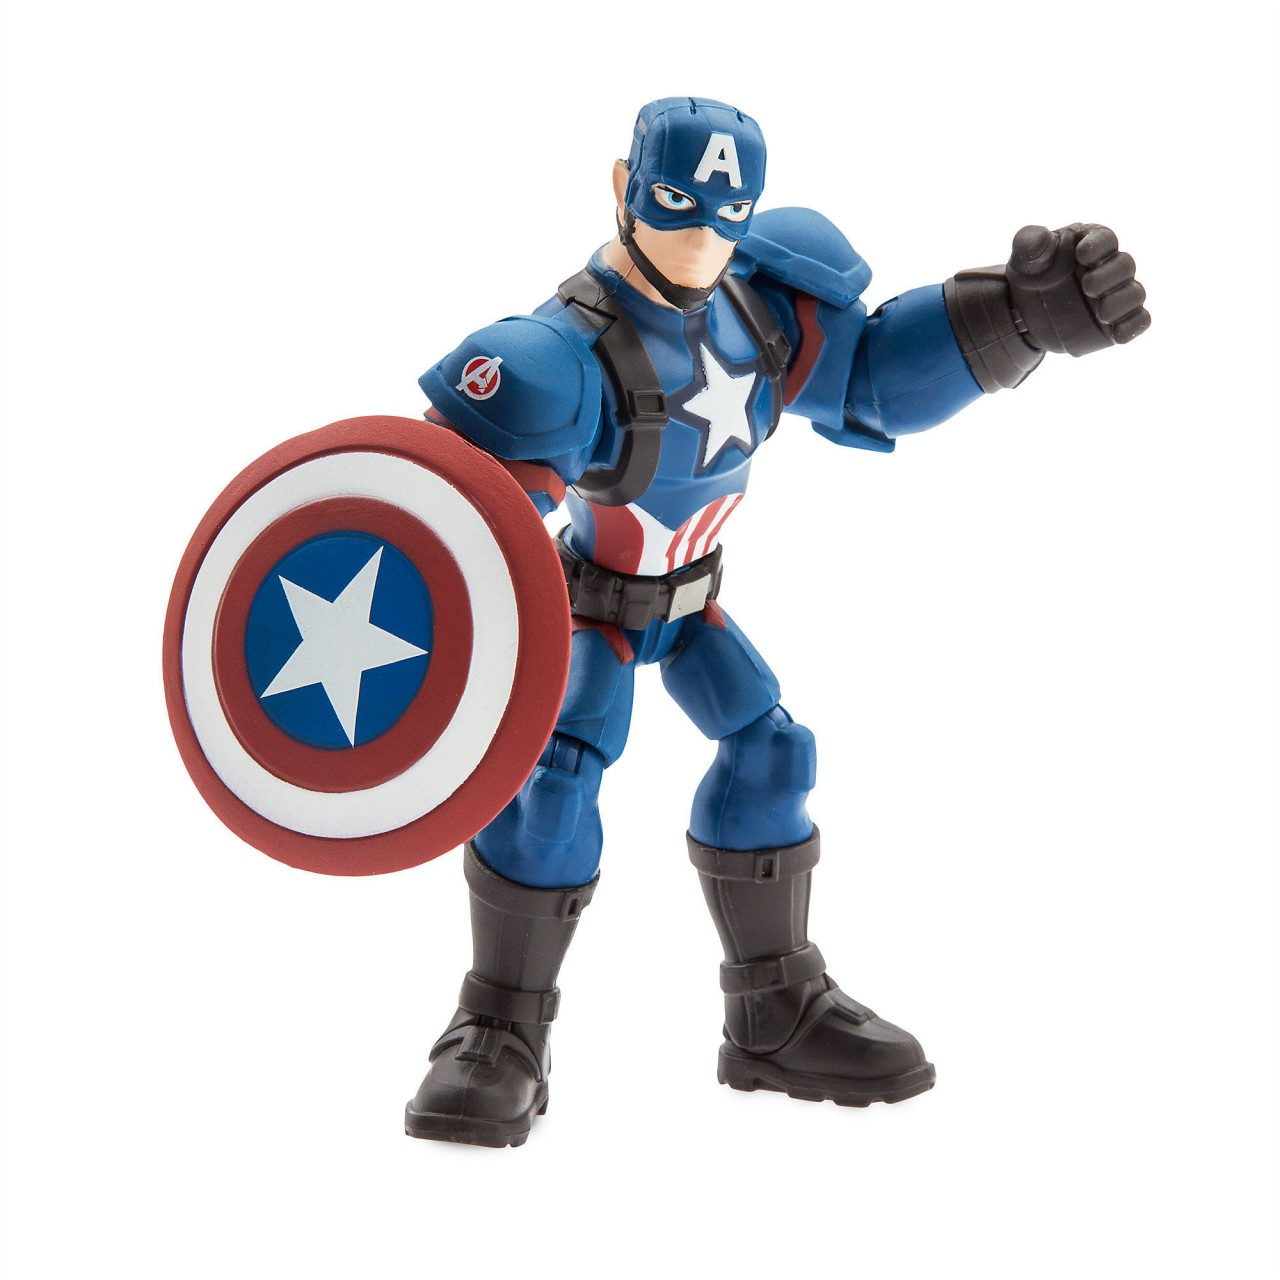 "Фигурка супер-героя Капитан Америка 13см ""Marvel Toybox"" от Disney"